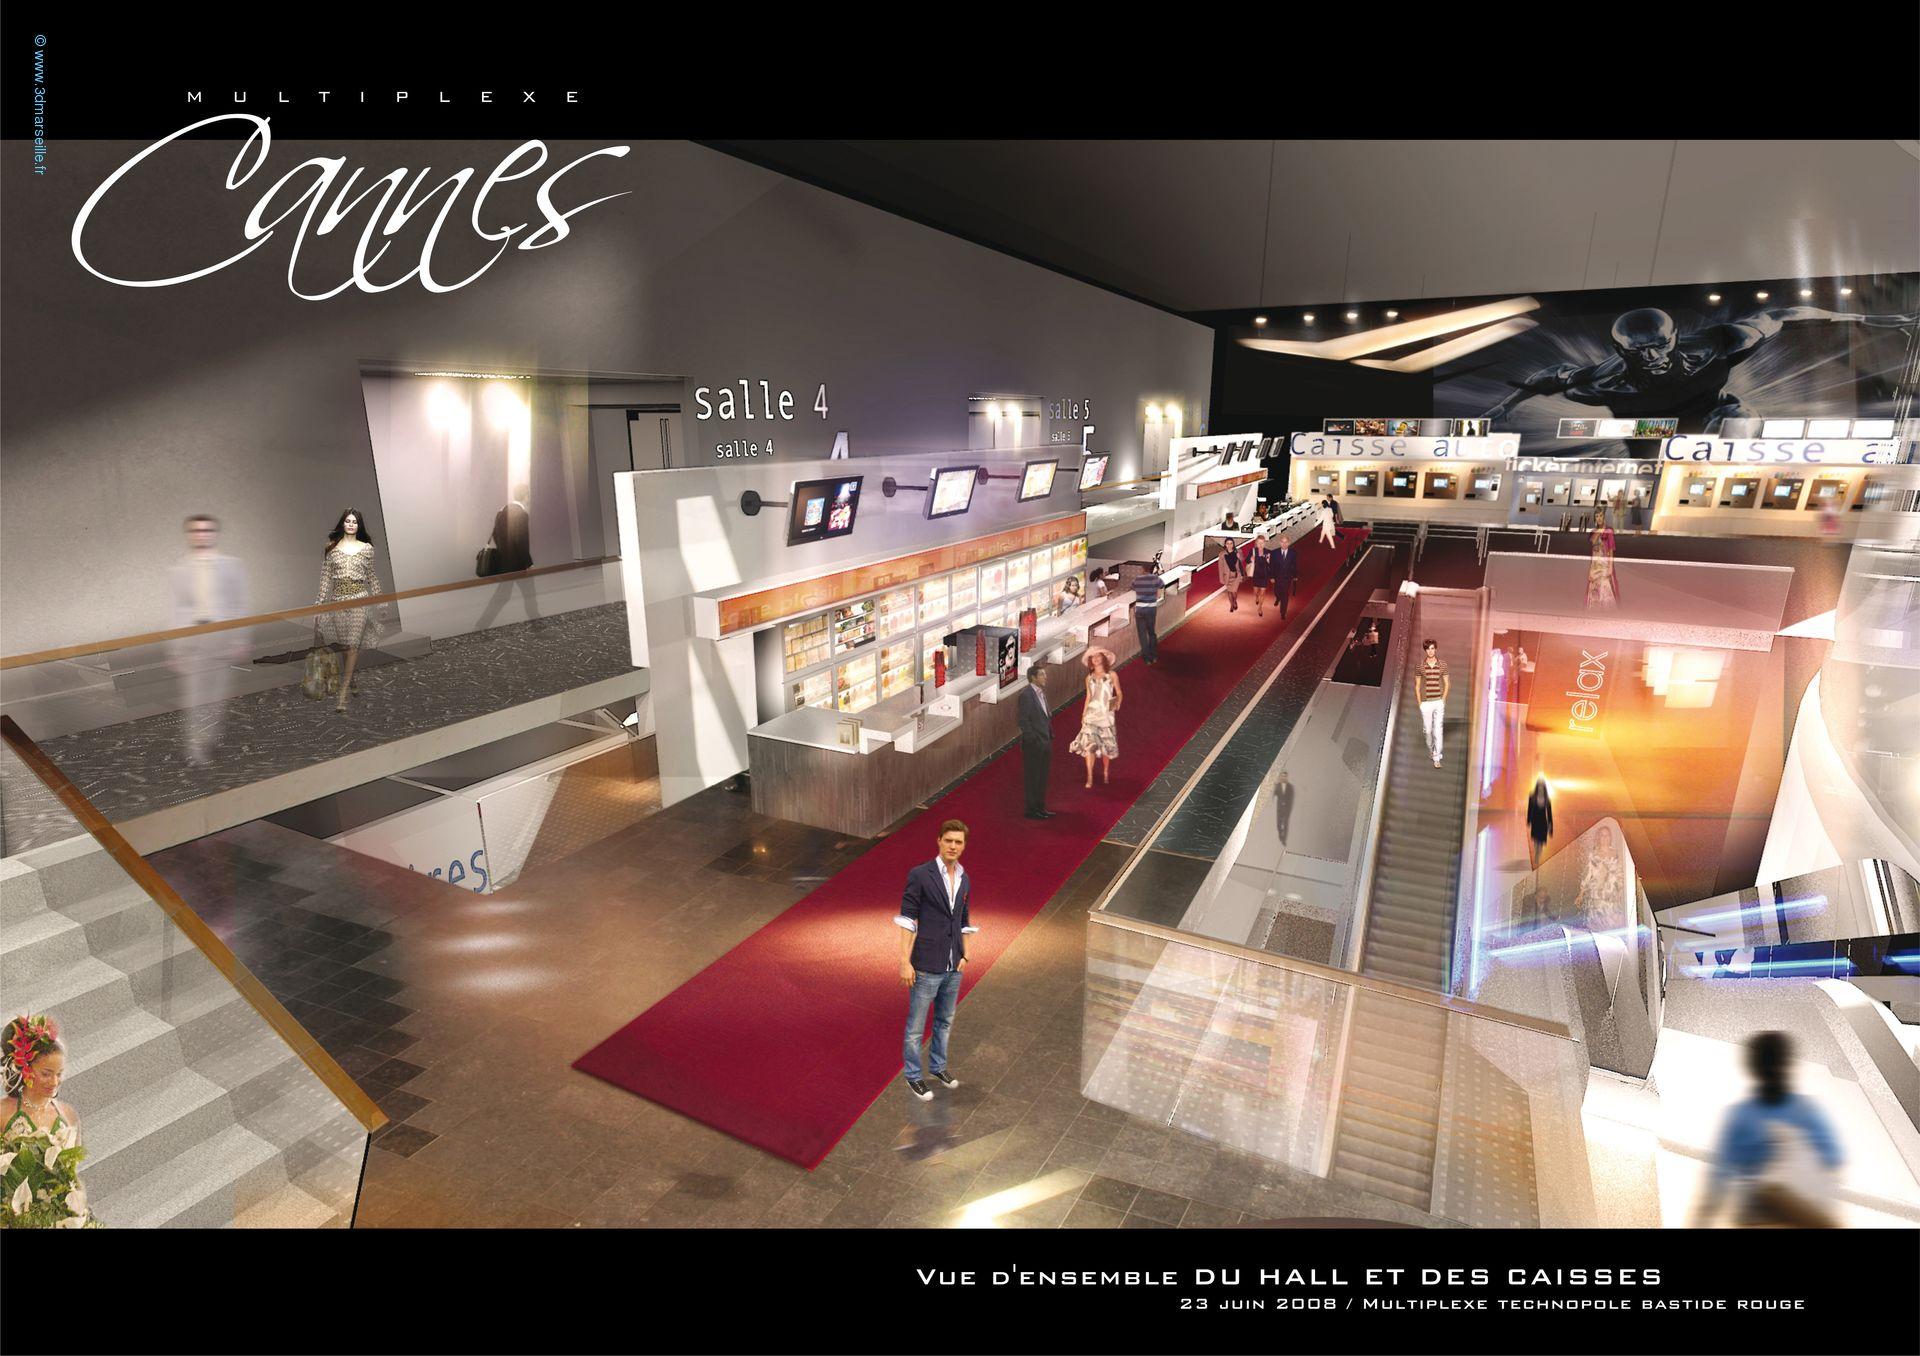 Multiplexe cinéma Kinepolis